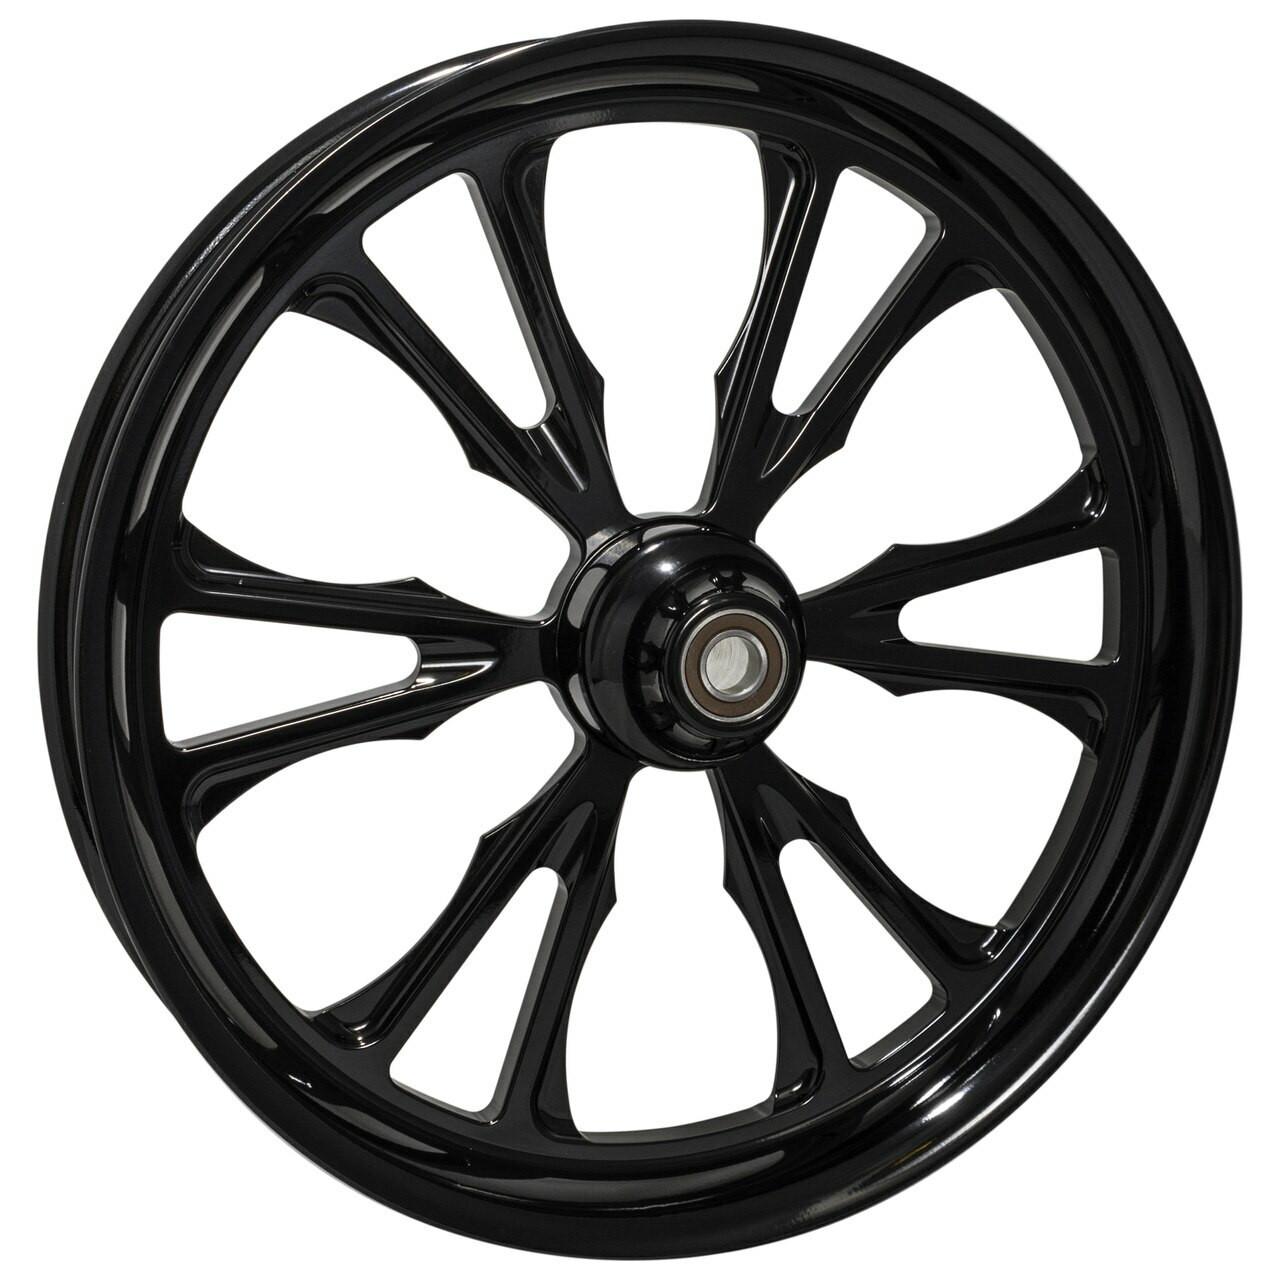 Black Road Glide Wheels Exhile